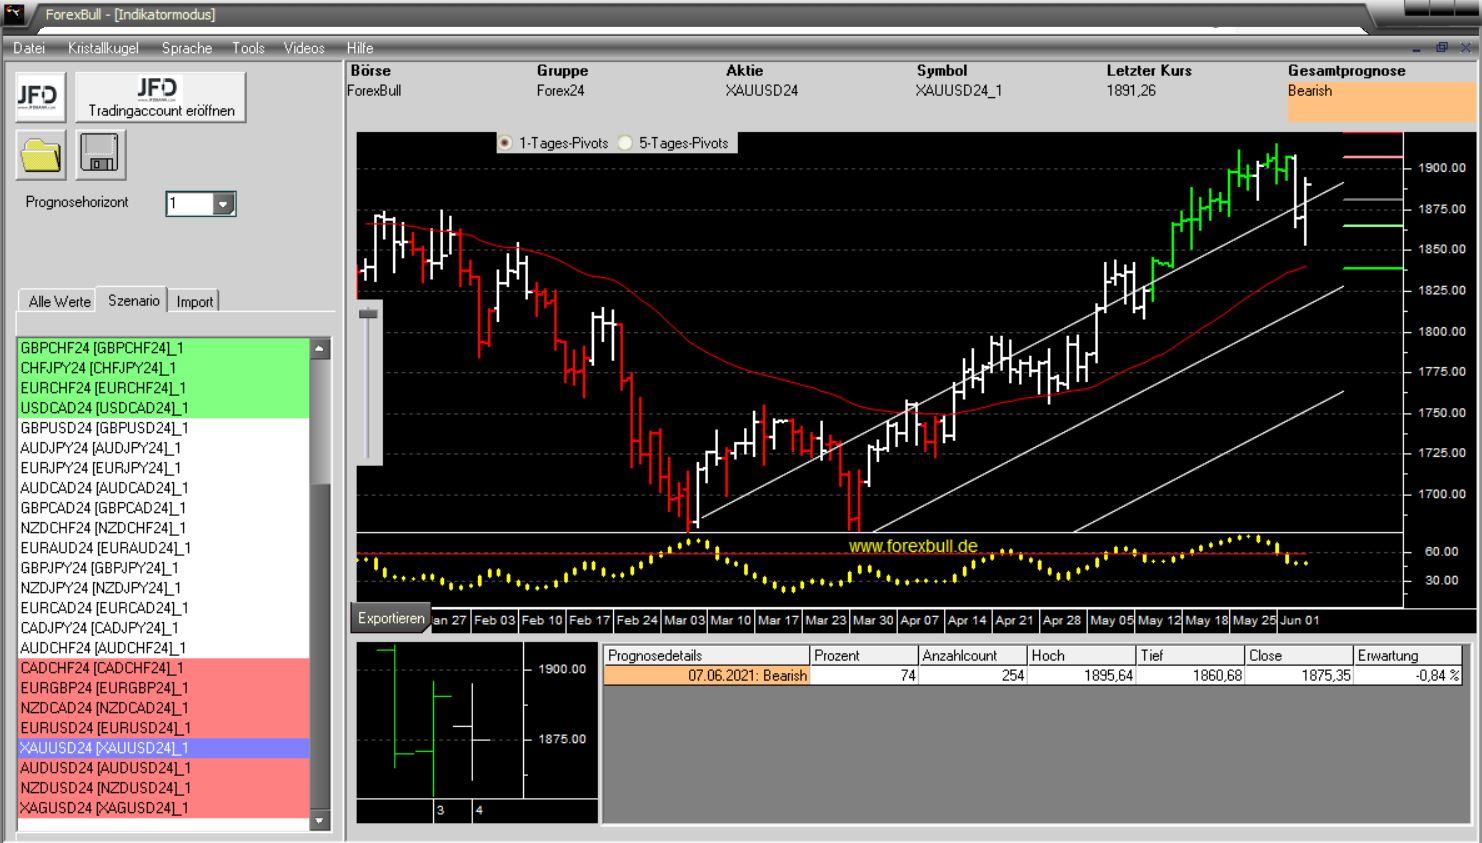 Morning-Briefing-ForexBull-GOLD-und-SILBER-mit-Short-Setups-Chartanalyse-JFD-Bank-GodmodeTrader.de-3